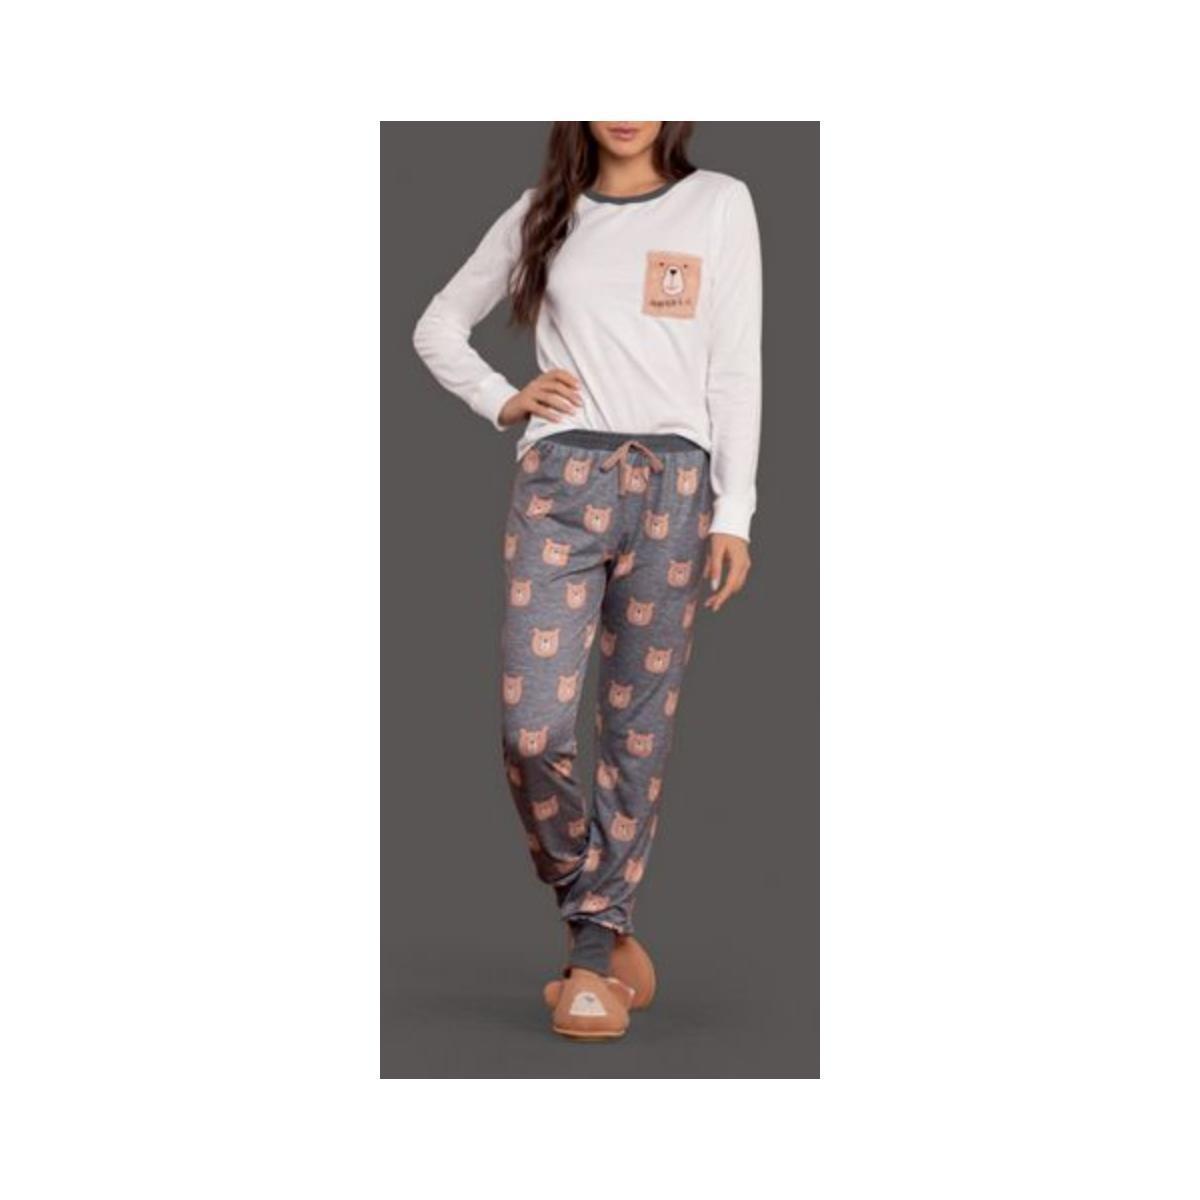 Pijama Feminina Lua Lua 120175 Off White/cinza